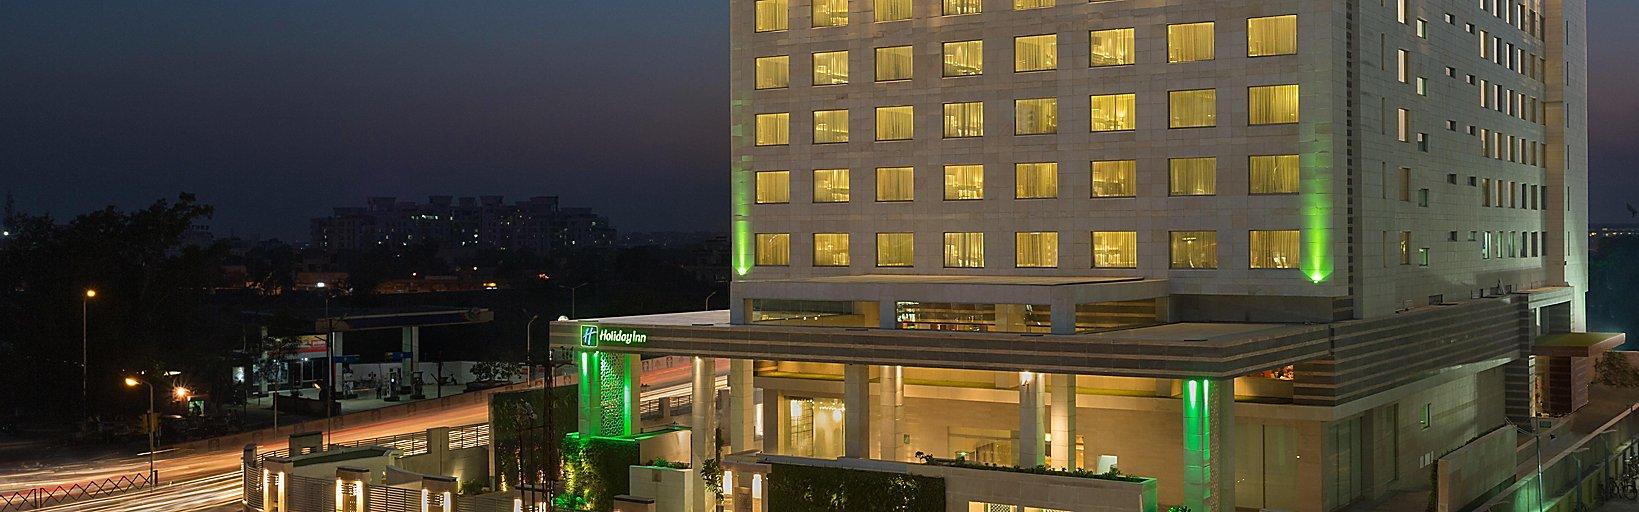 Holiday Inn Jaipur City Centre - Hotel Reviews & Photos